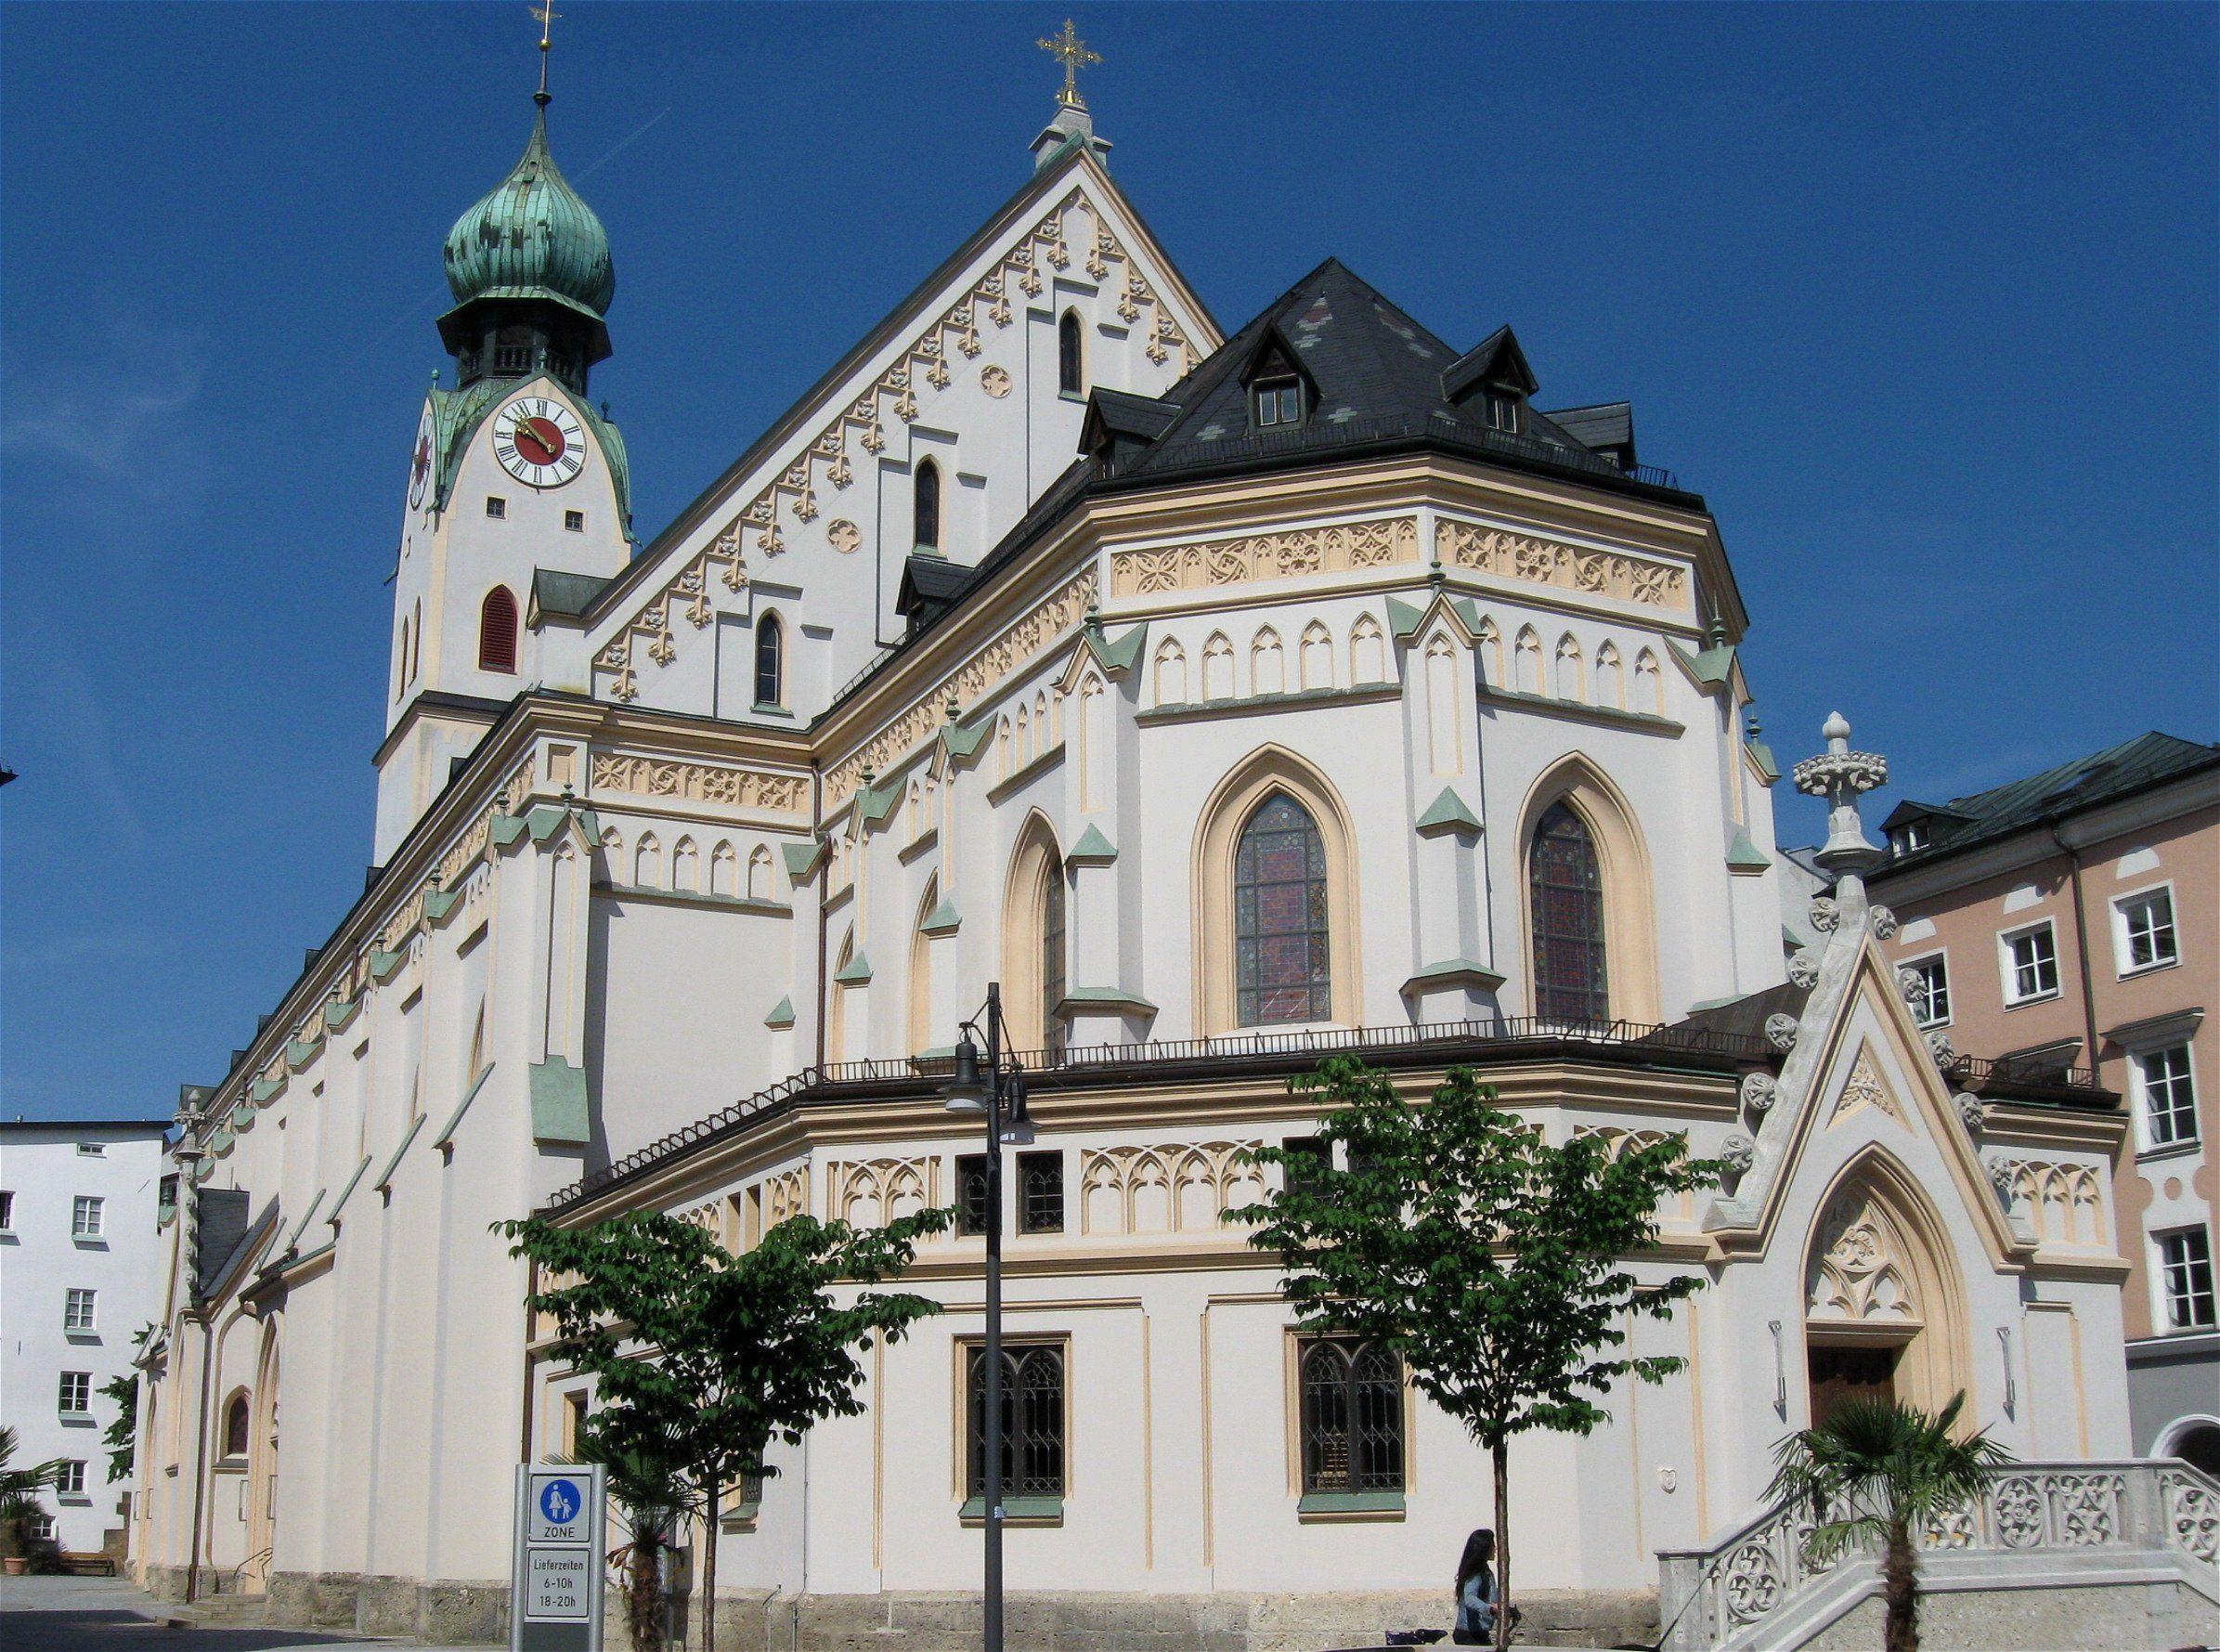 Rosenheim Baviere Rosenheim St Nikolaus Bayern